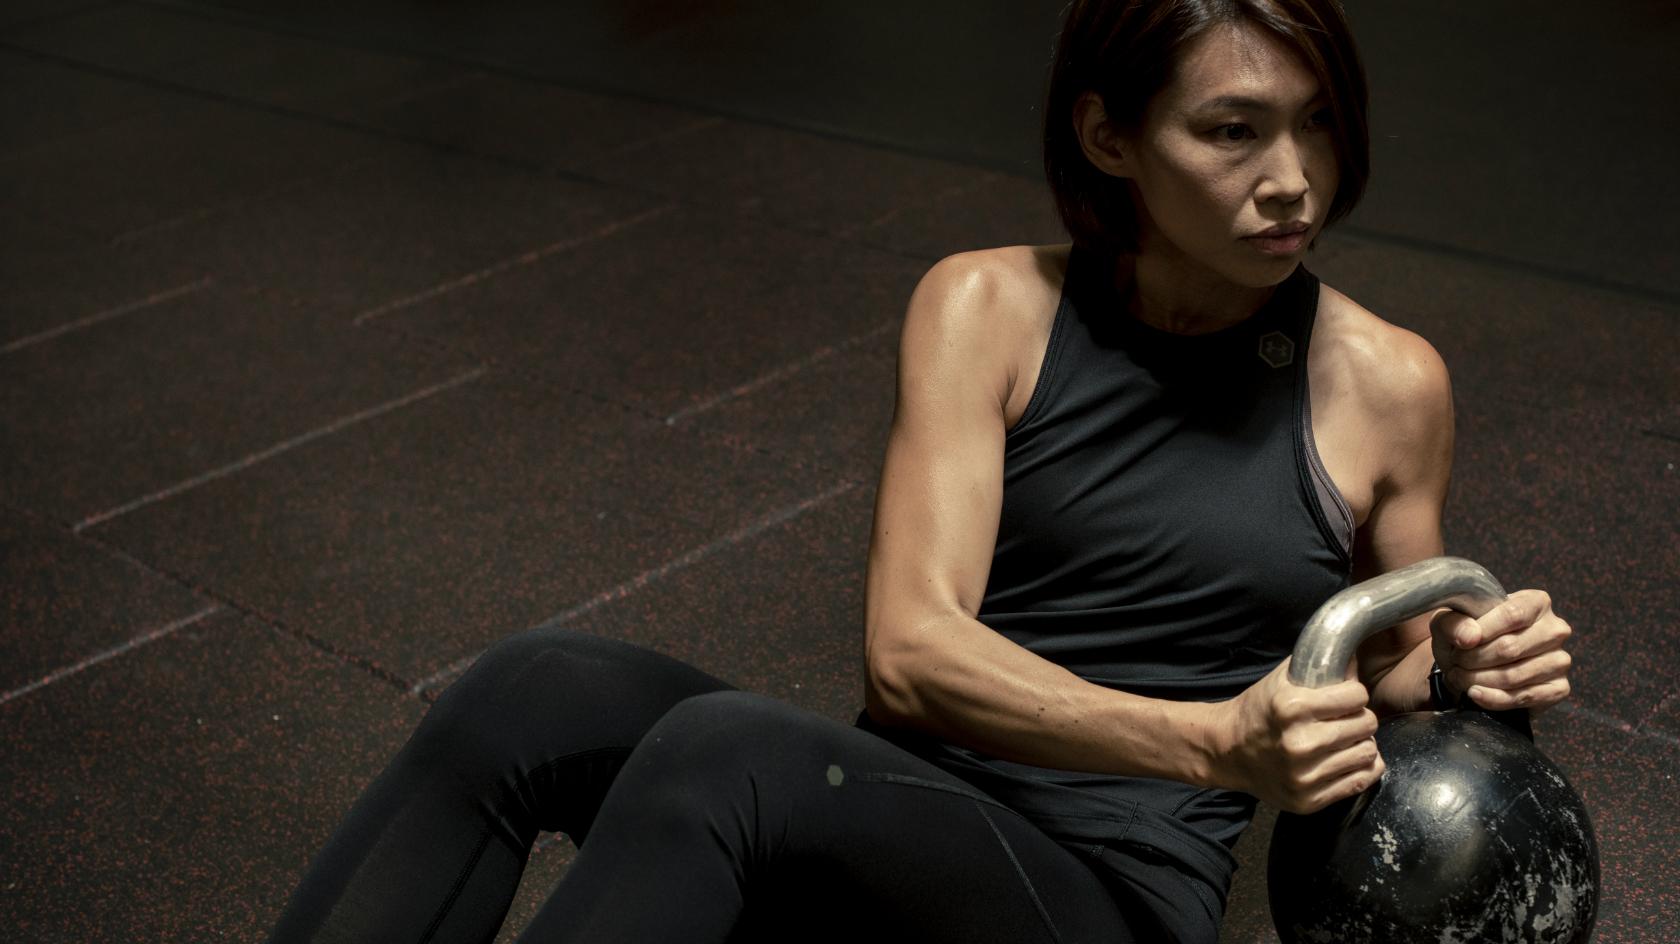 42Race – The top virtual race platform for better health